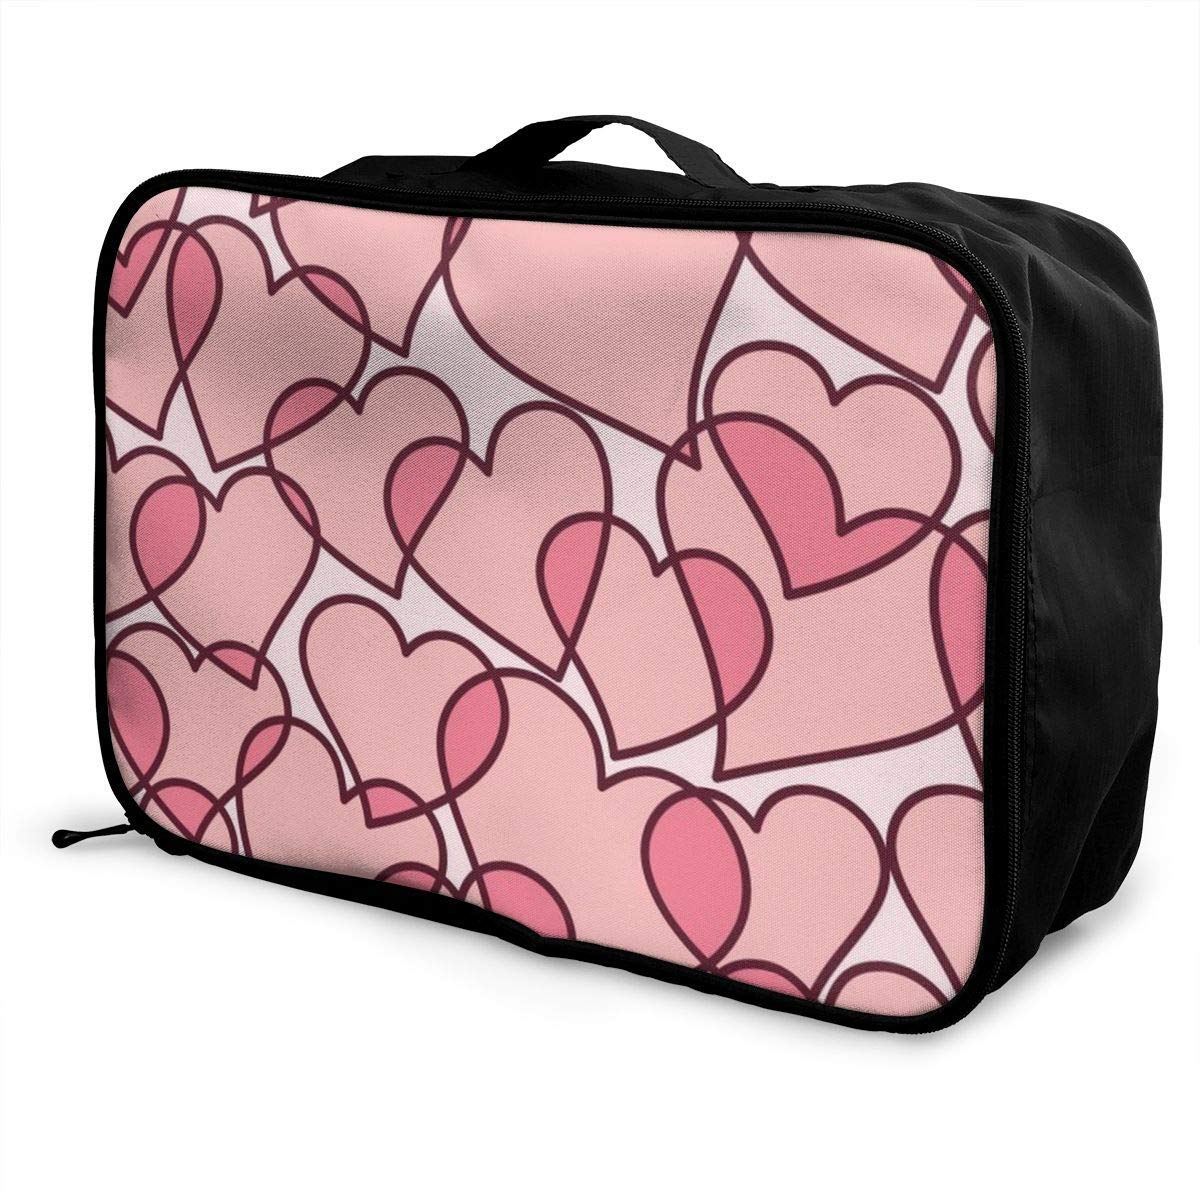 Sweet Heart Travel Duffel Bag Waterproof Fashion Lightweight Large Capacity Portable Duffel Bag for Men /& Women JTRVW Luggage Bags for Travel